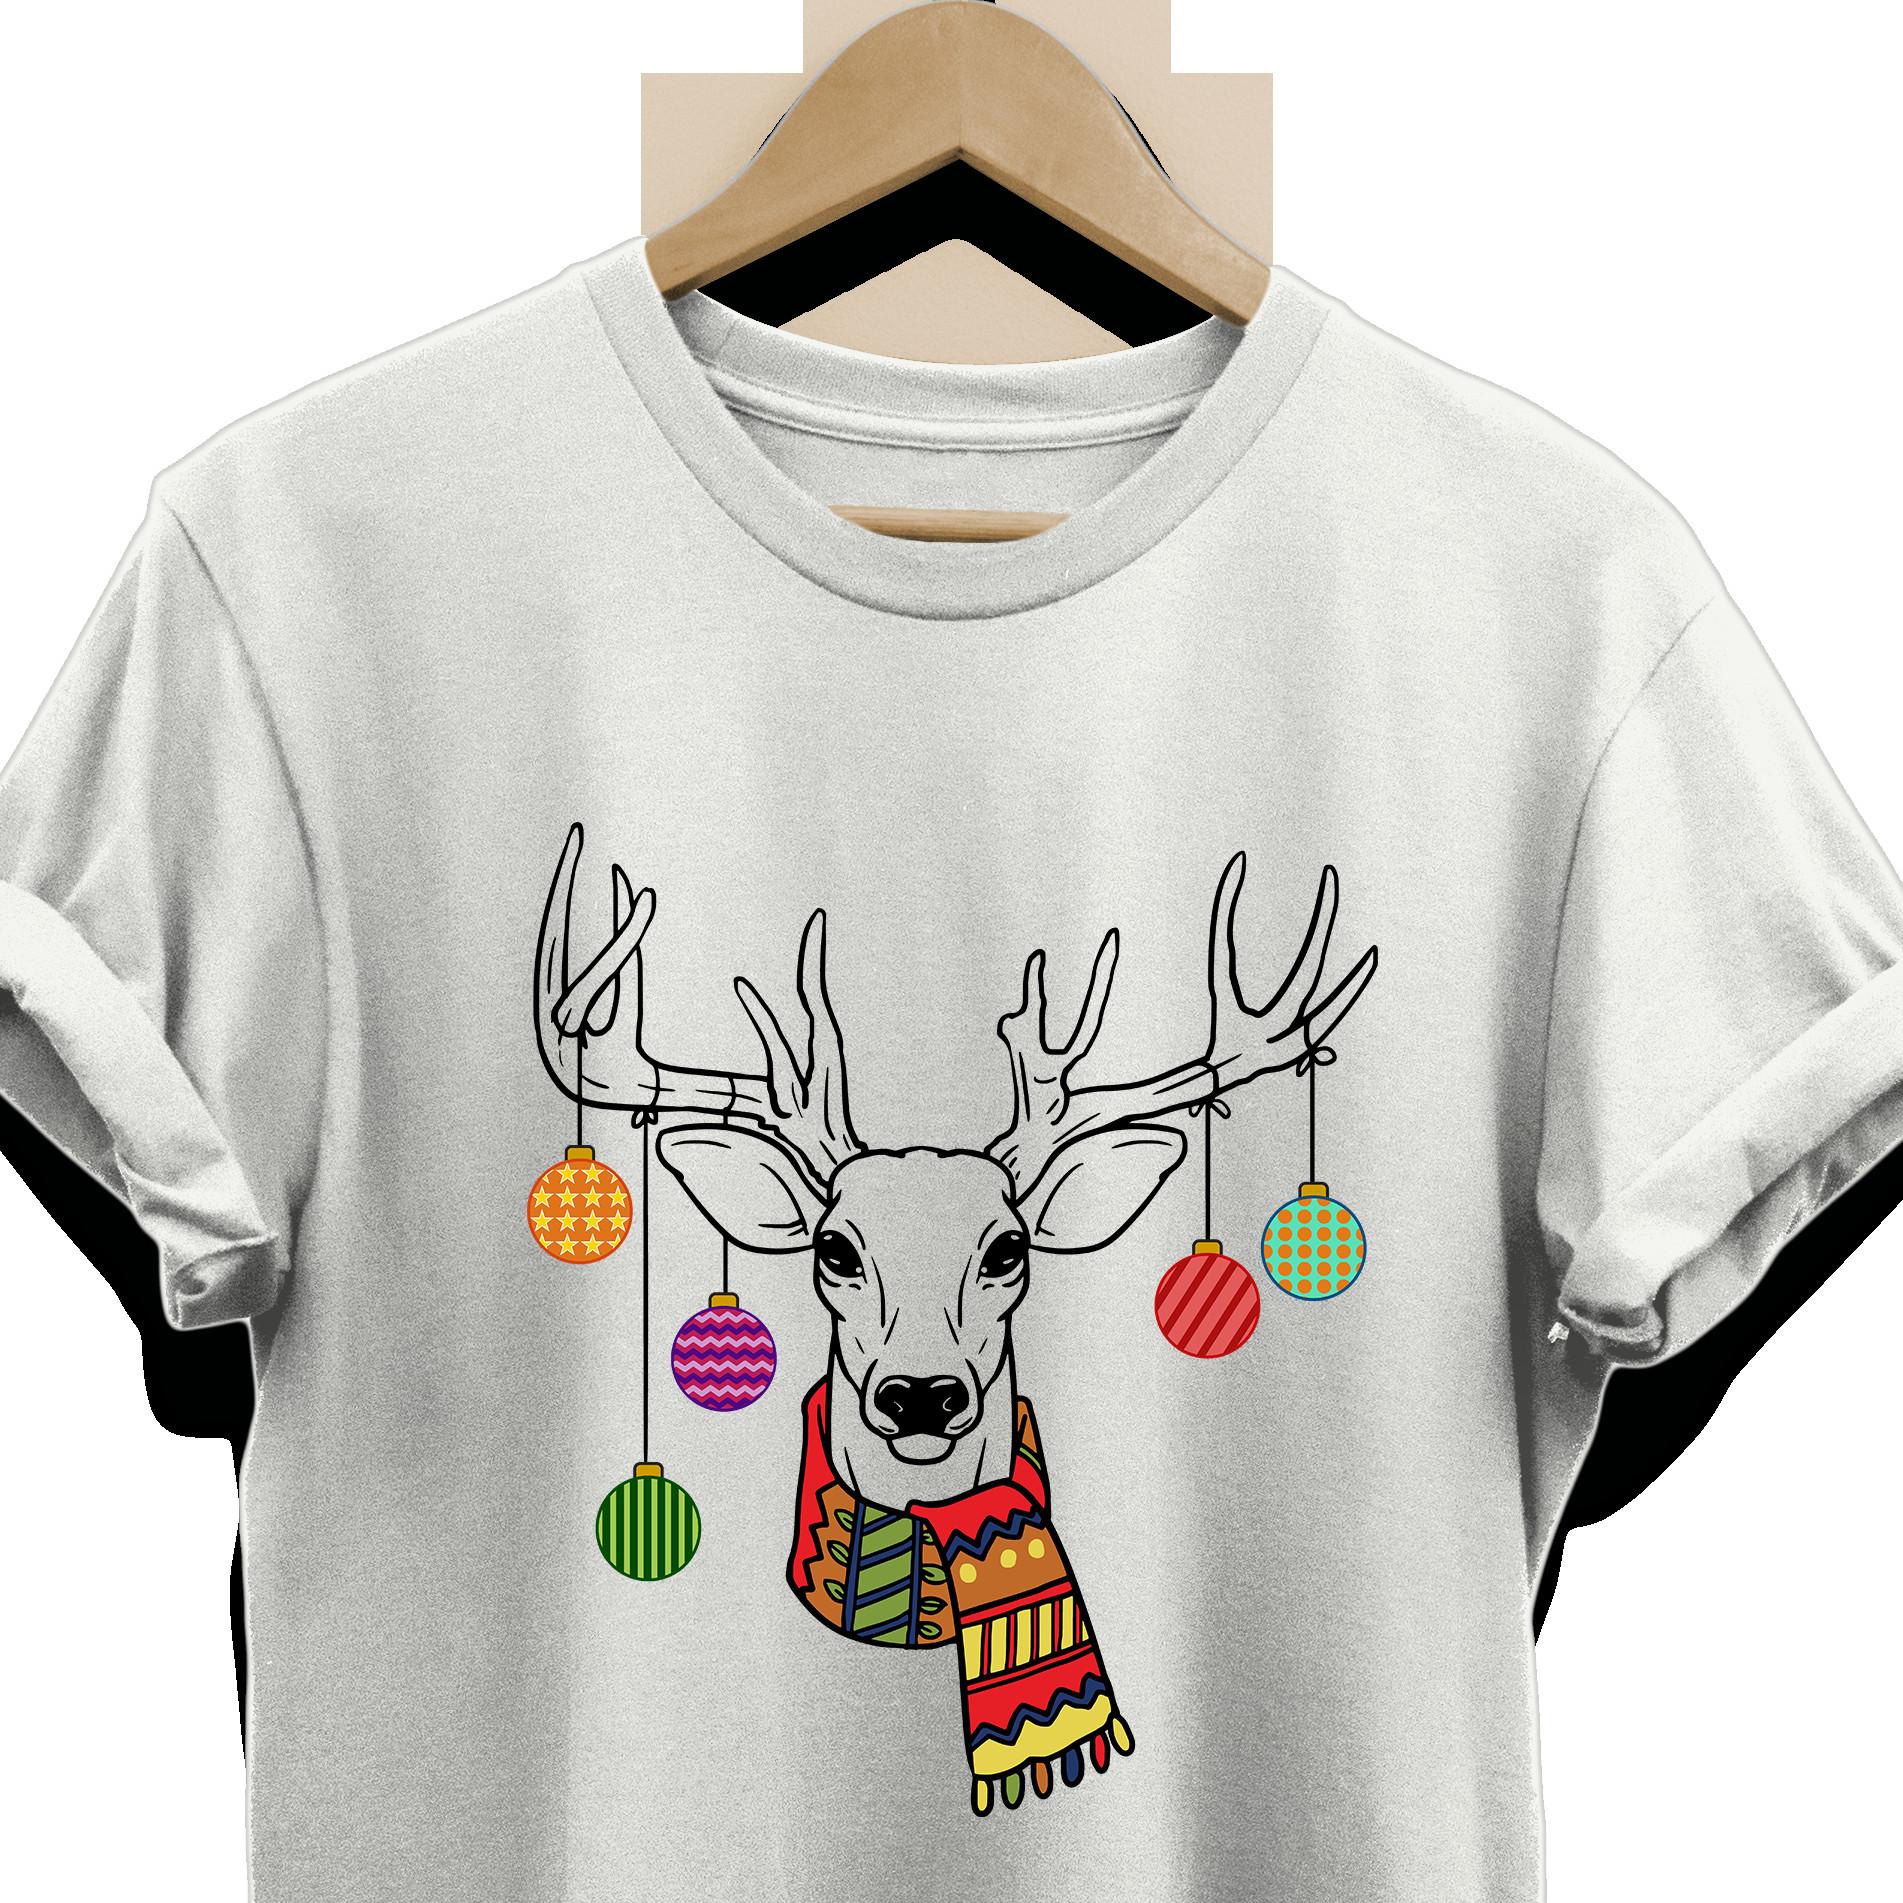 Hunting Gifts For Kids  Christmas Ornaments Deer Tee Shirt for Men Women Boys